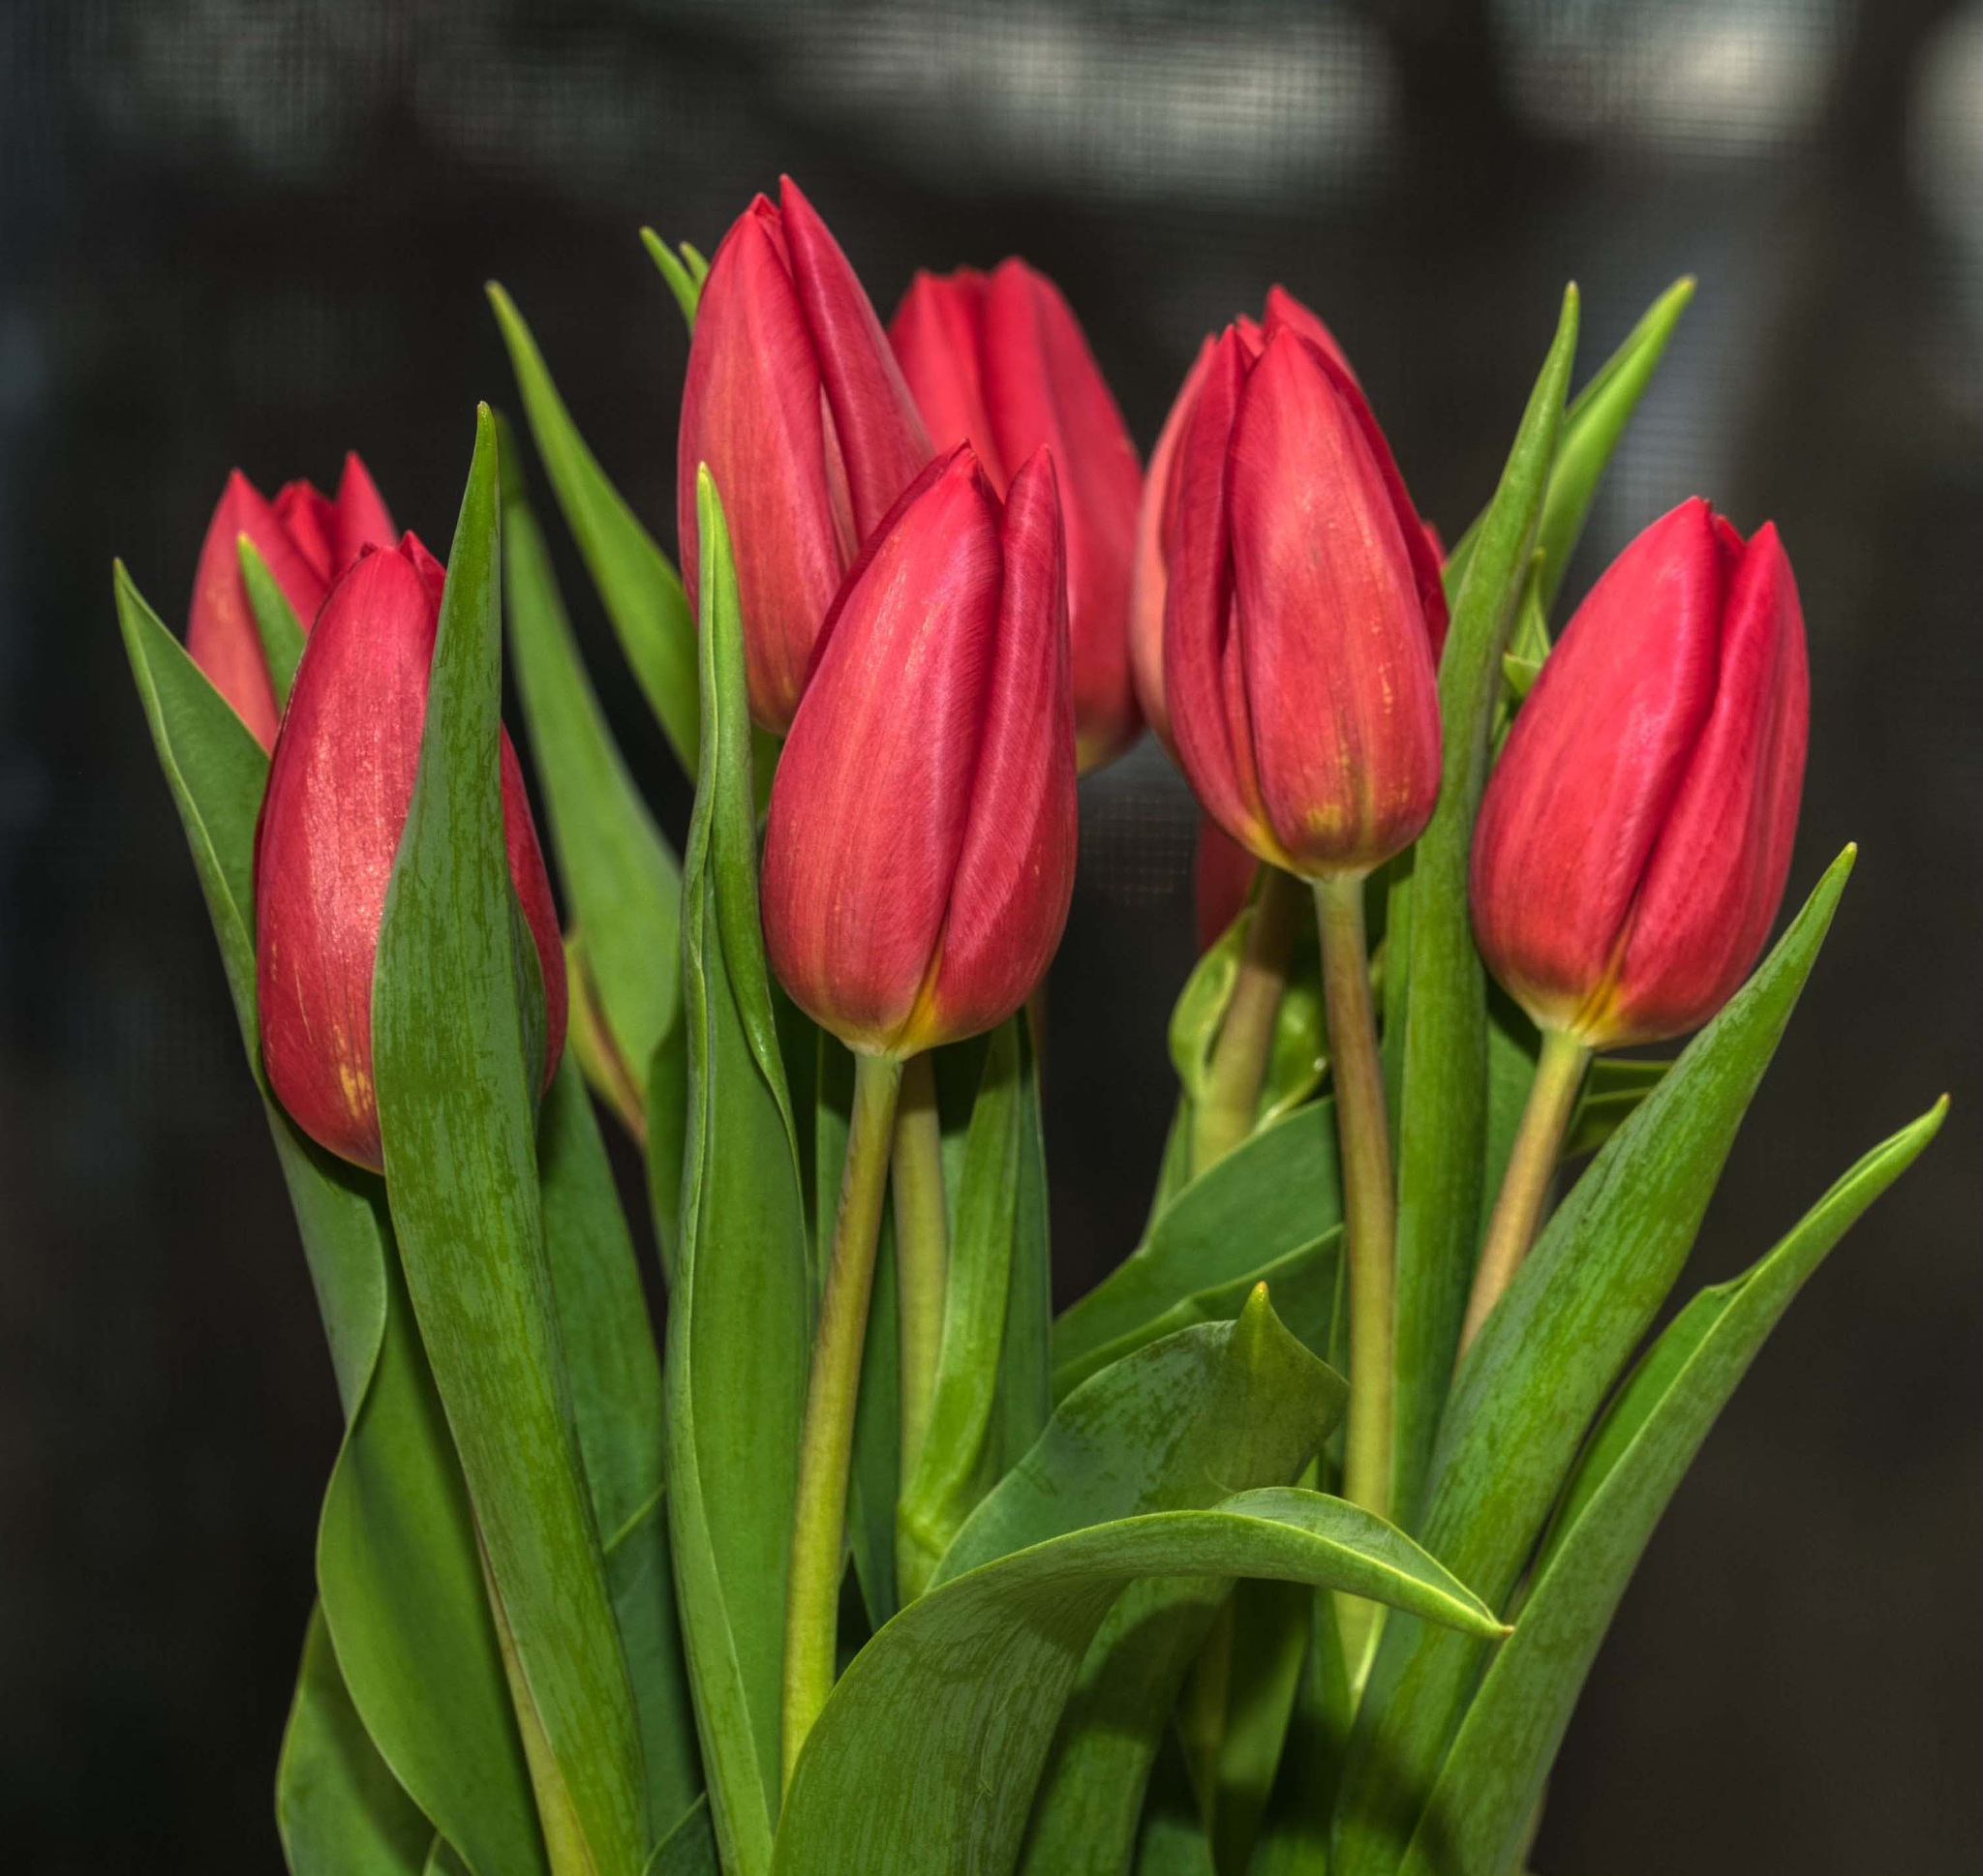 tulips by Dan McGovern